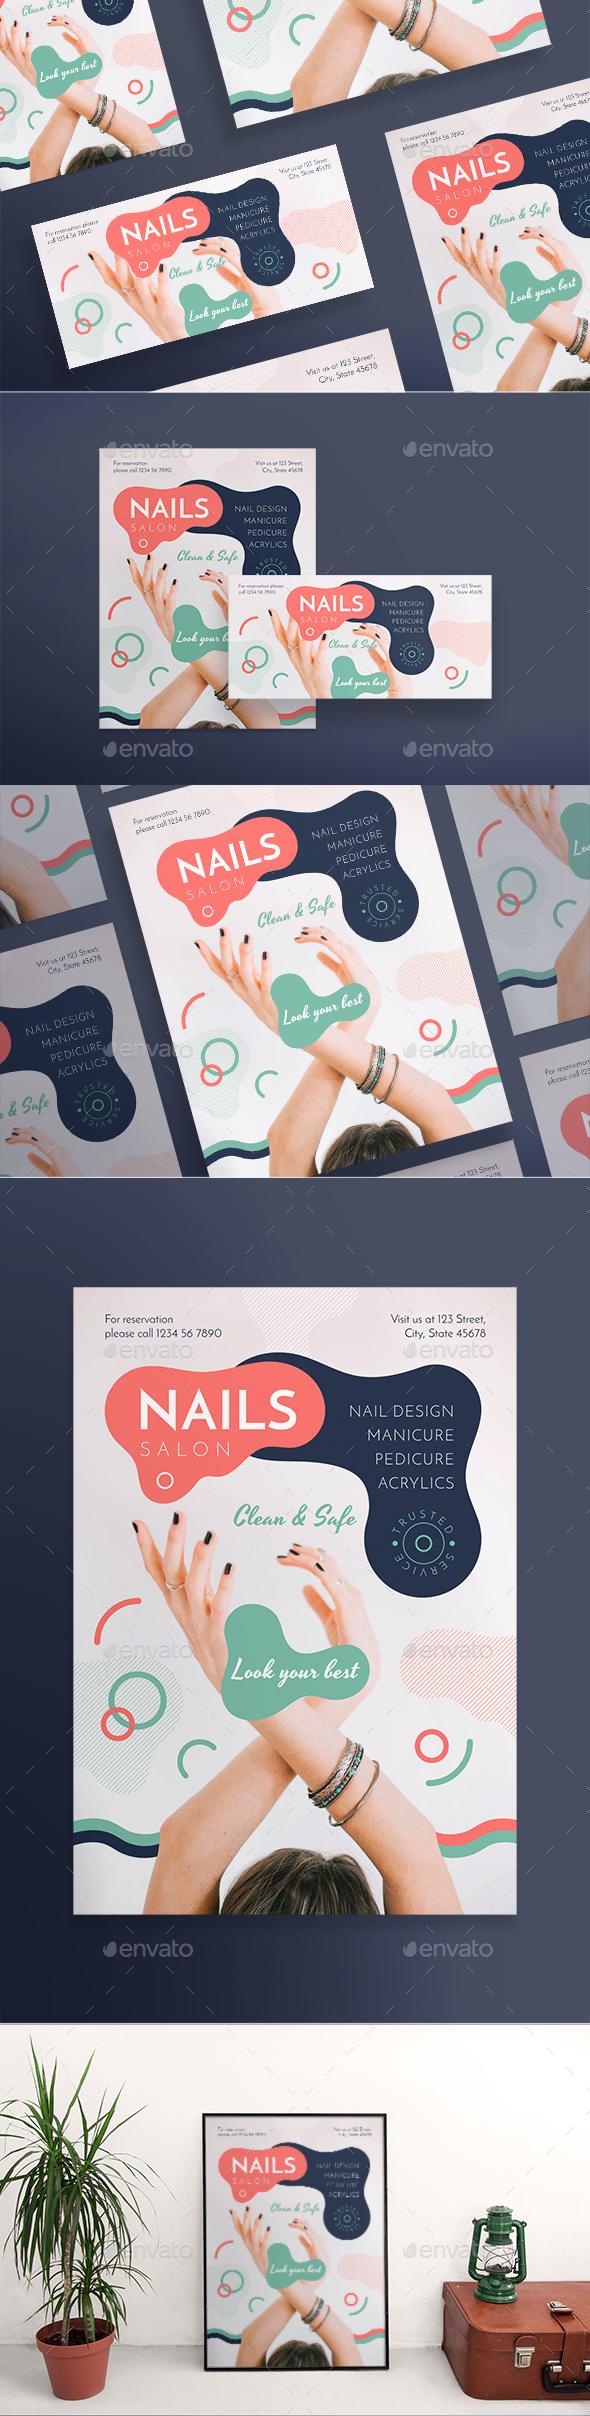 Nail Design Salon Flyers - Miscellaneous Events